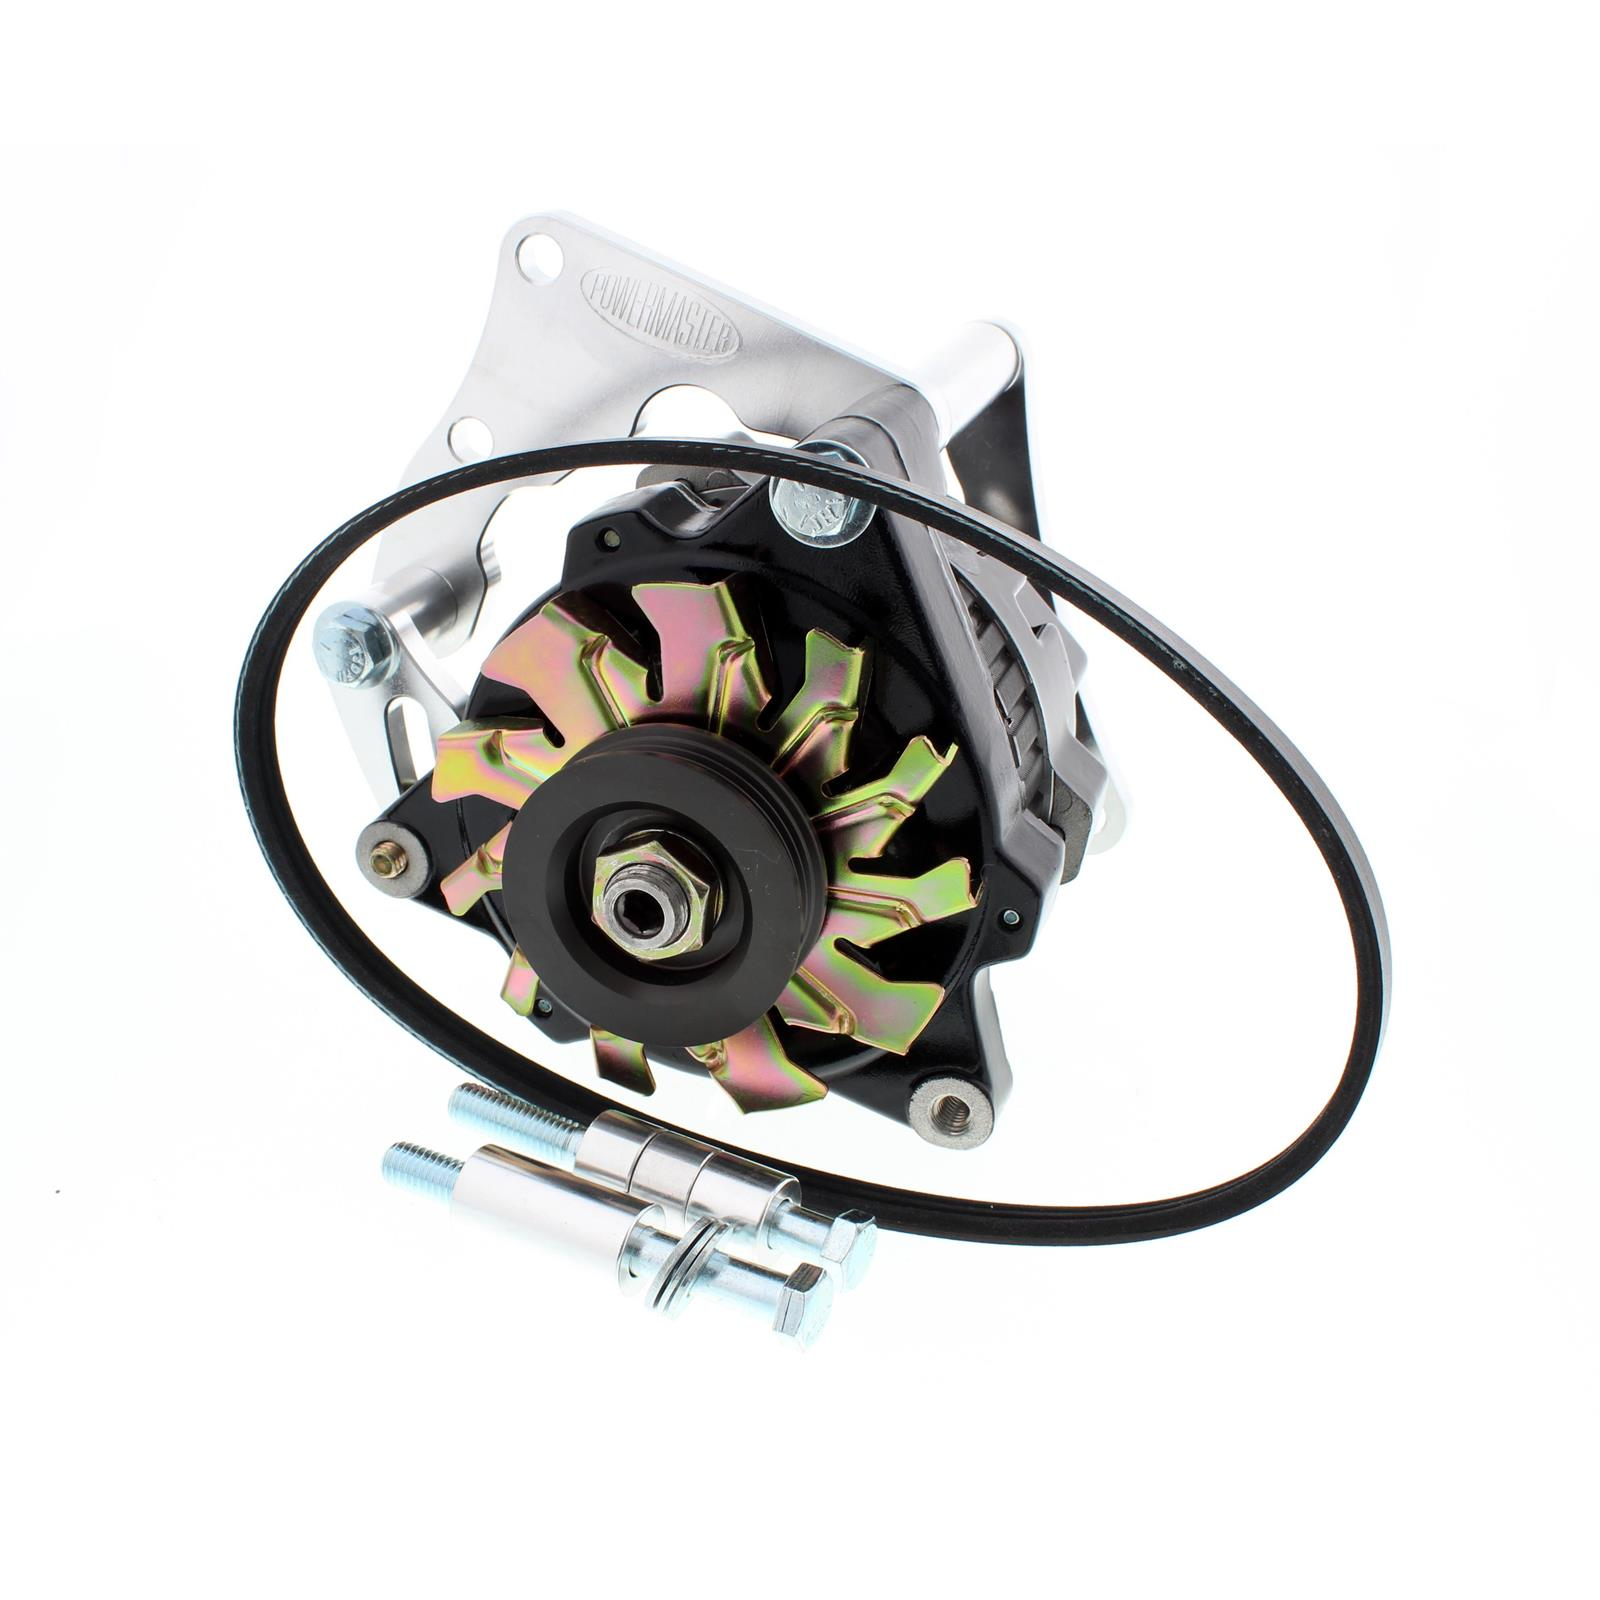 Powermaster 8-722 SB Chevy 75 Amp Mini Alternator w/Serp-Belt Kit